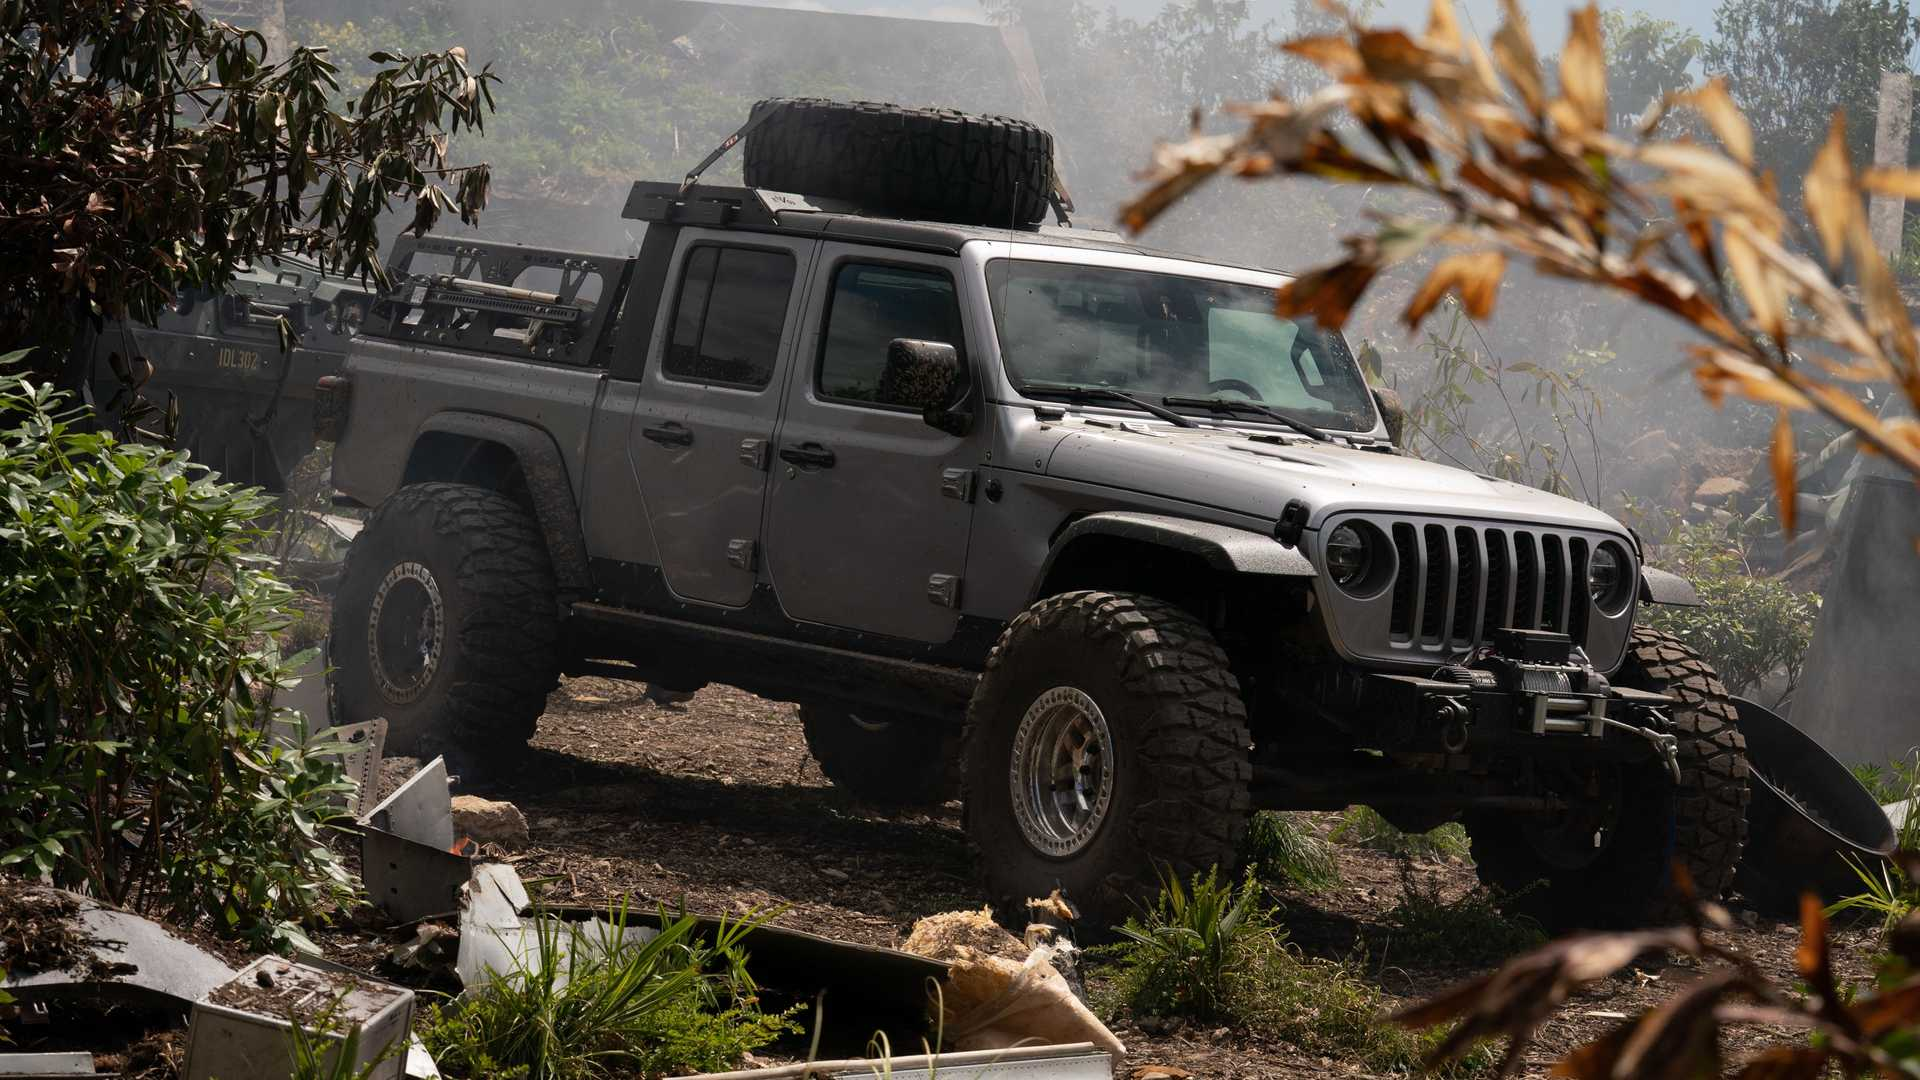 tej-s-2019-jeep-gladiator